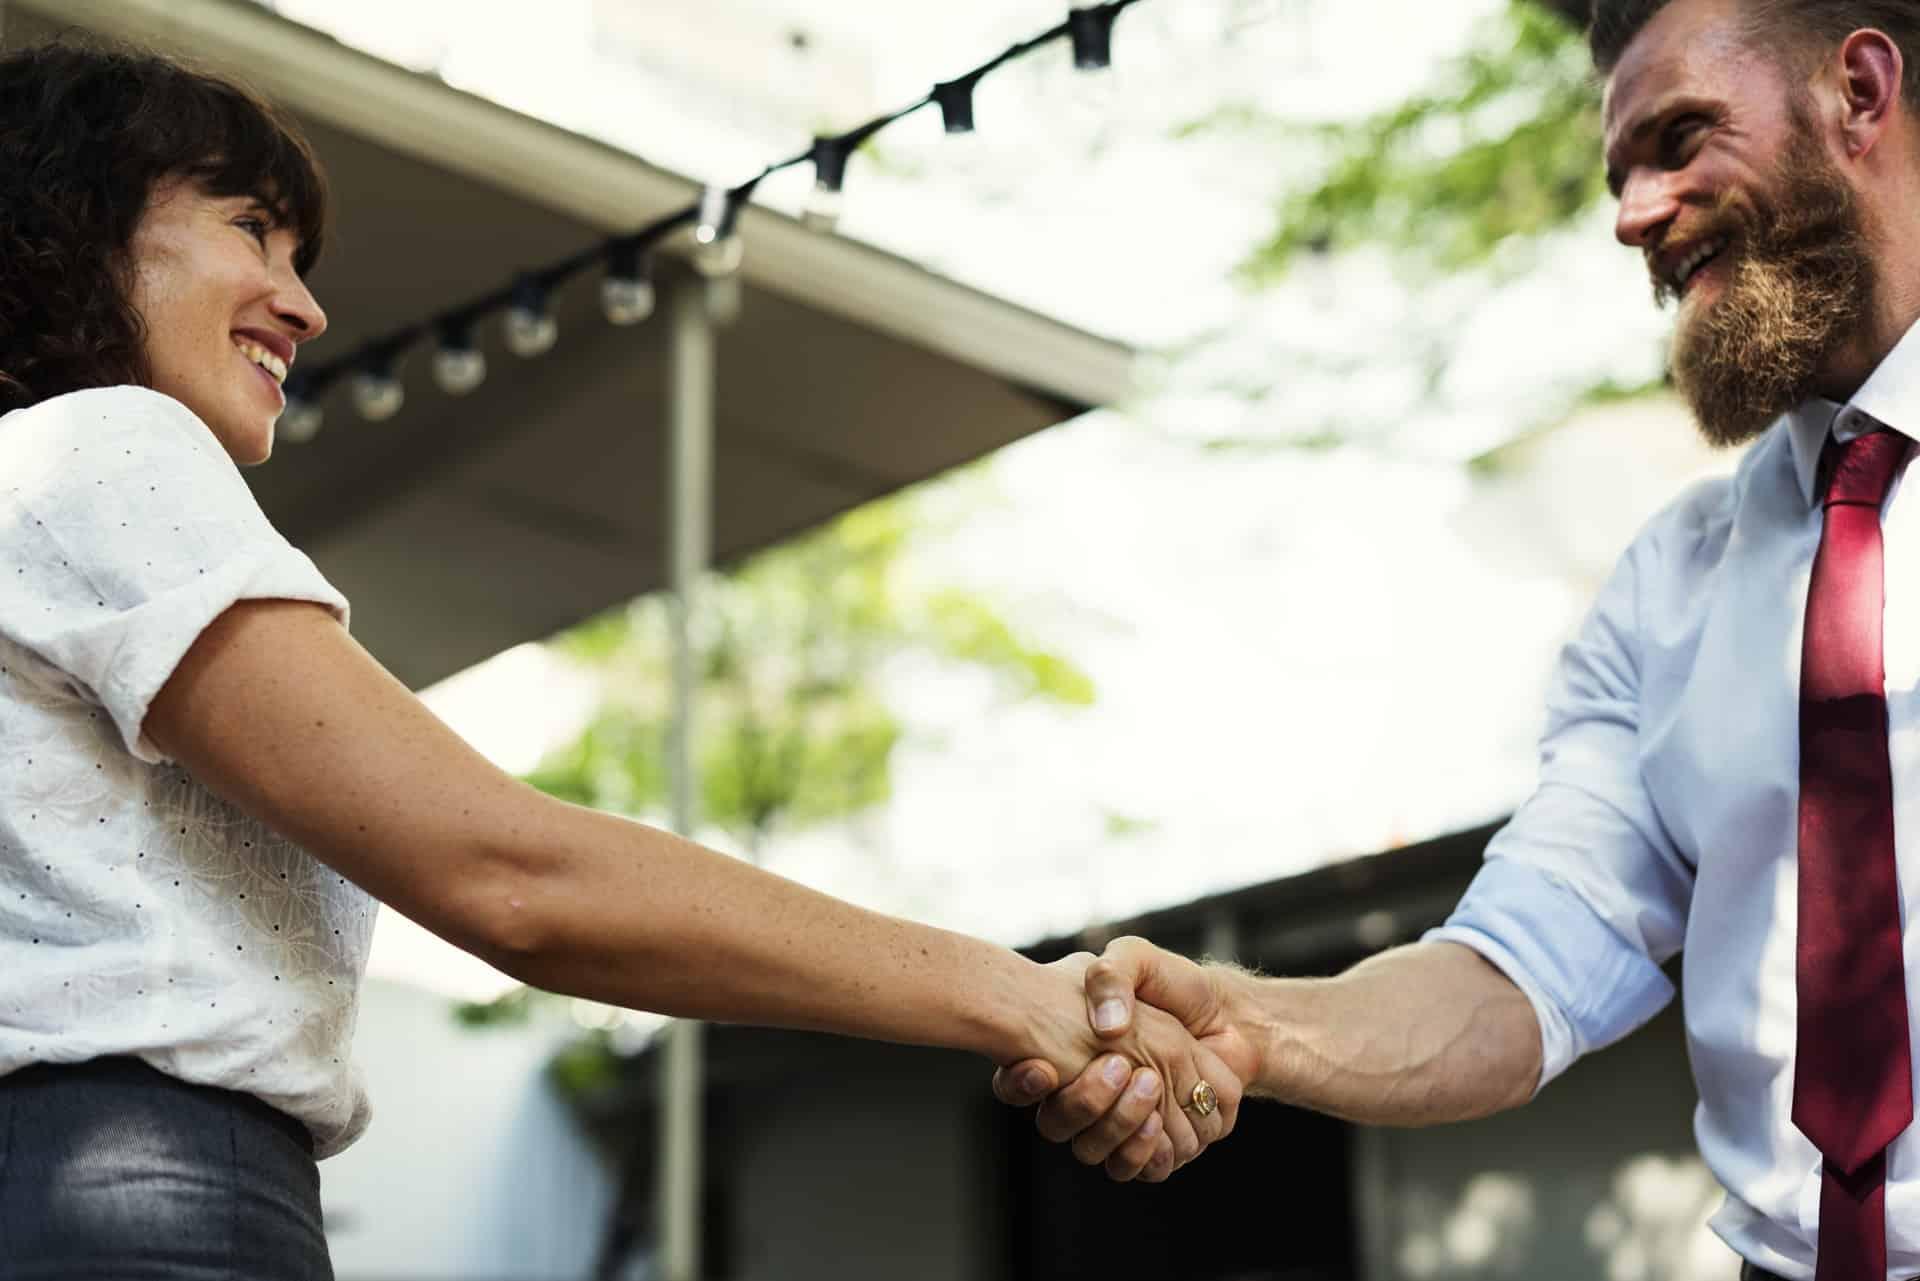 customer service tips - make it personal